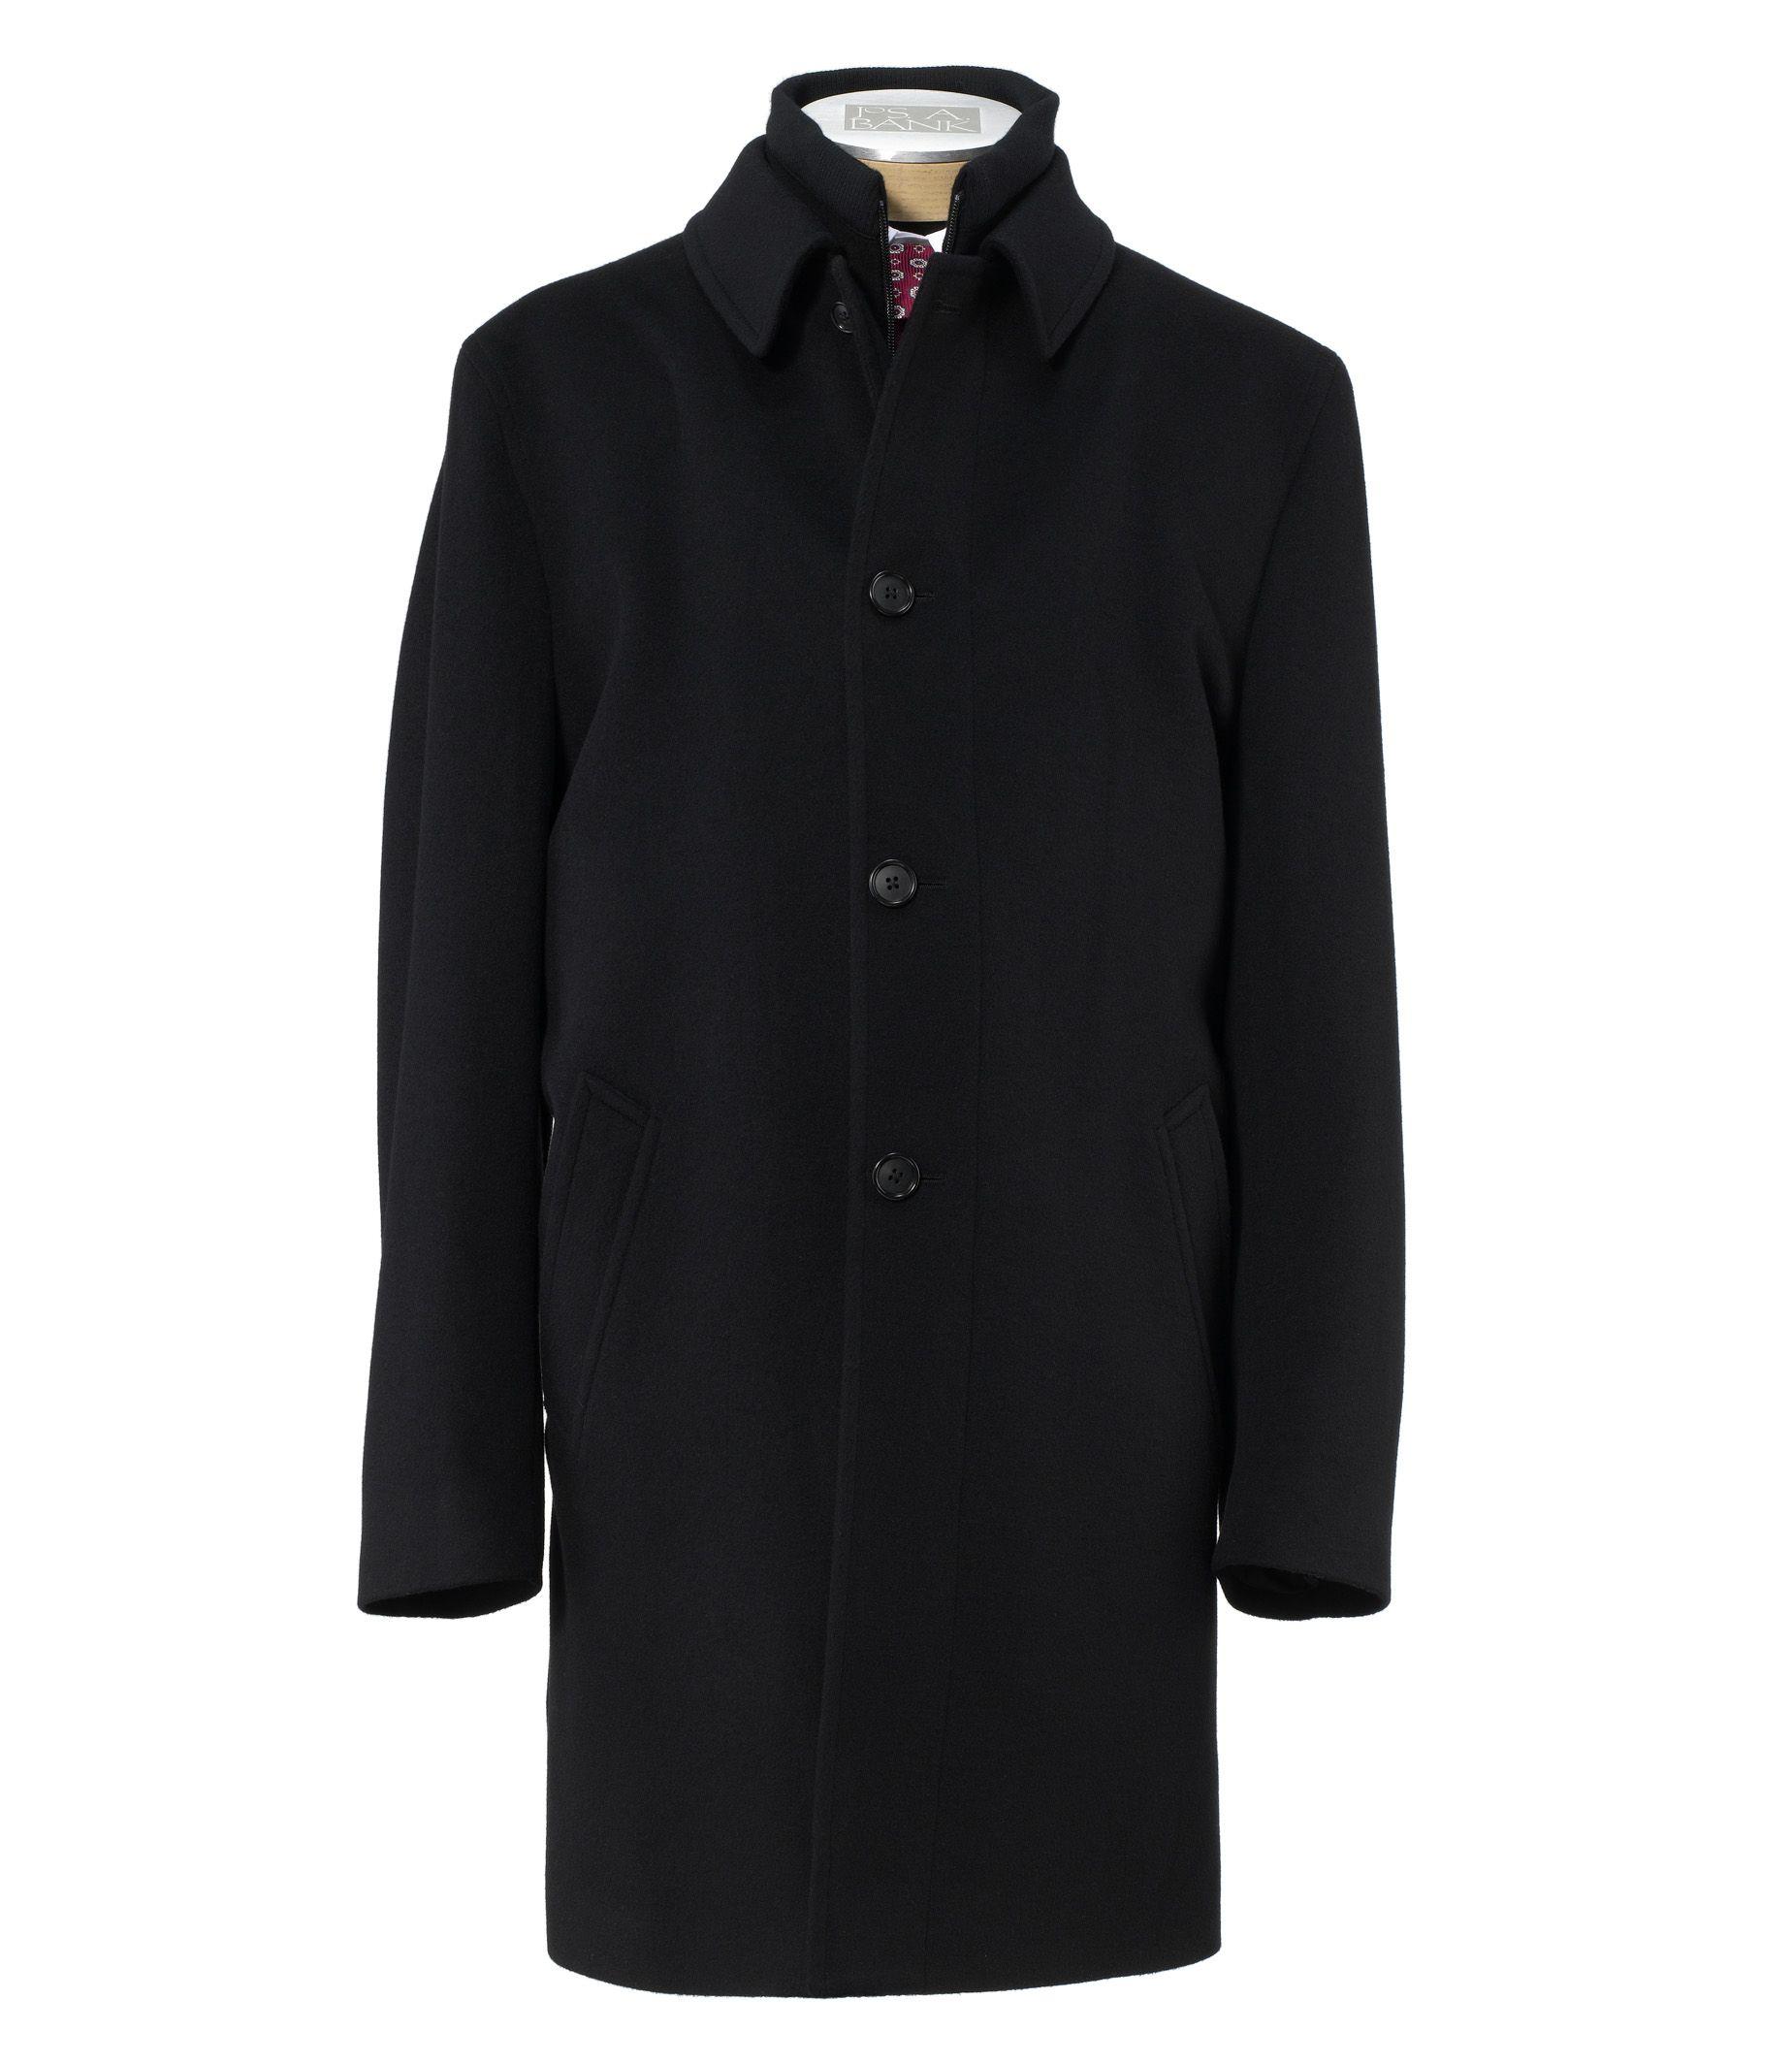 Shop Men's Clearance Outerwear Jackets & Coats | JoS. A. Bank